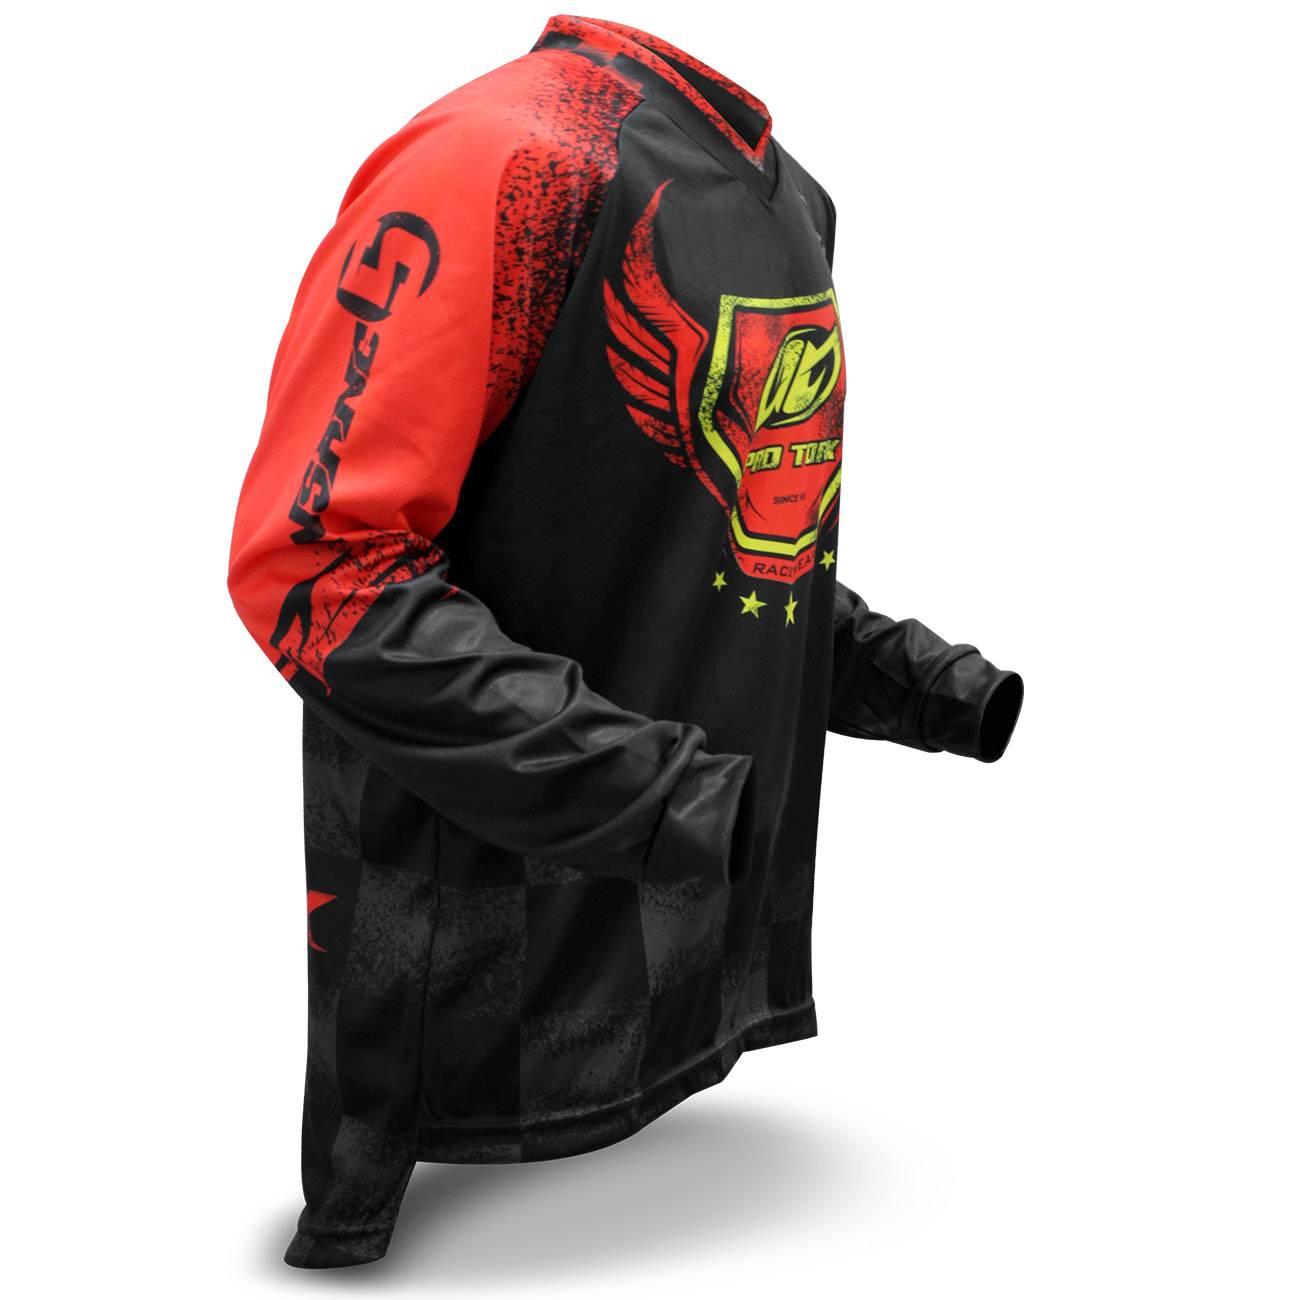 Camisa Motocross Pro Tork Insane 5 Adulto Vermelho Preto Trilha Tamanho GG